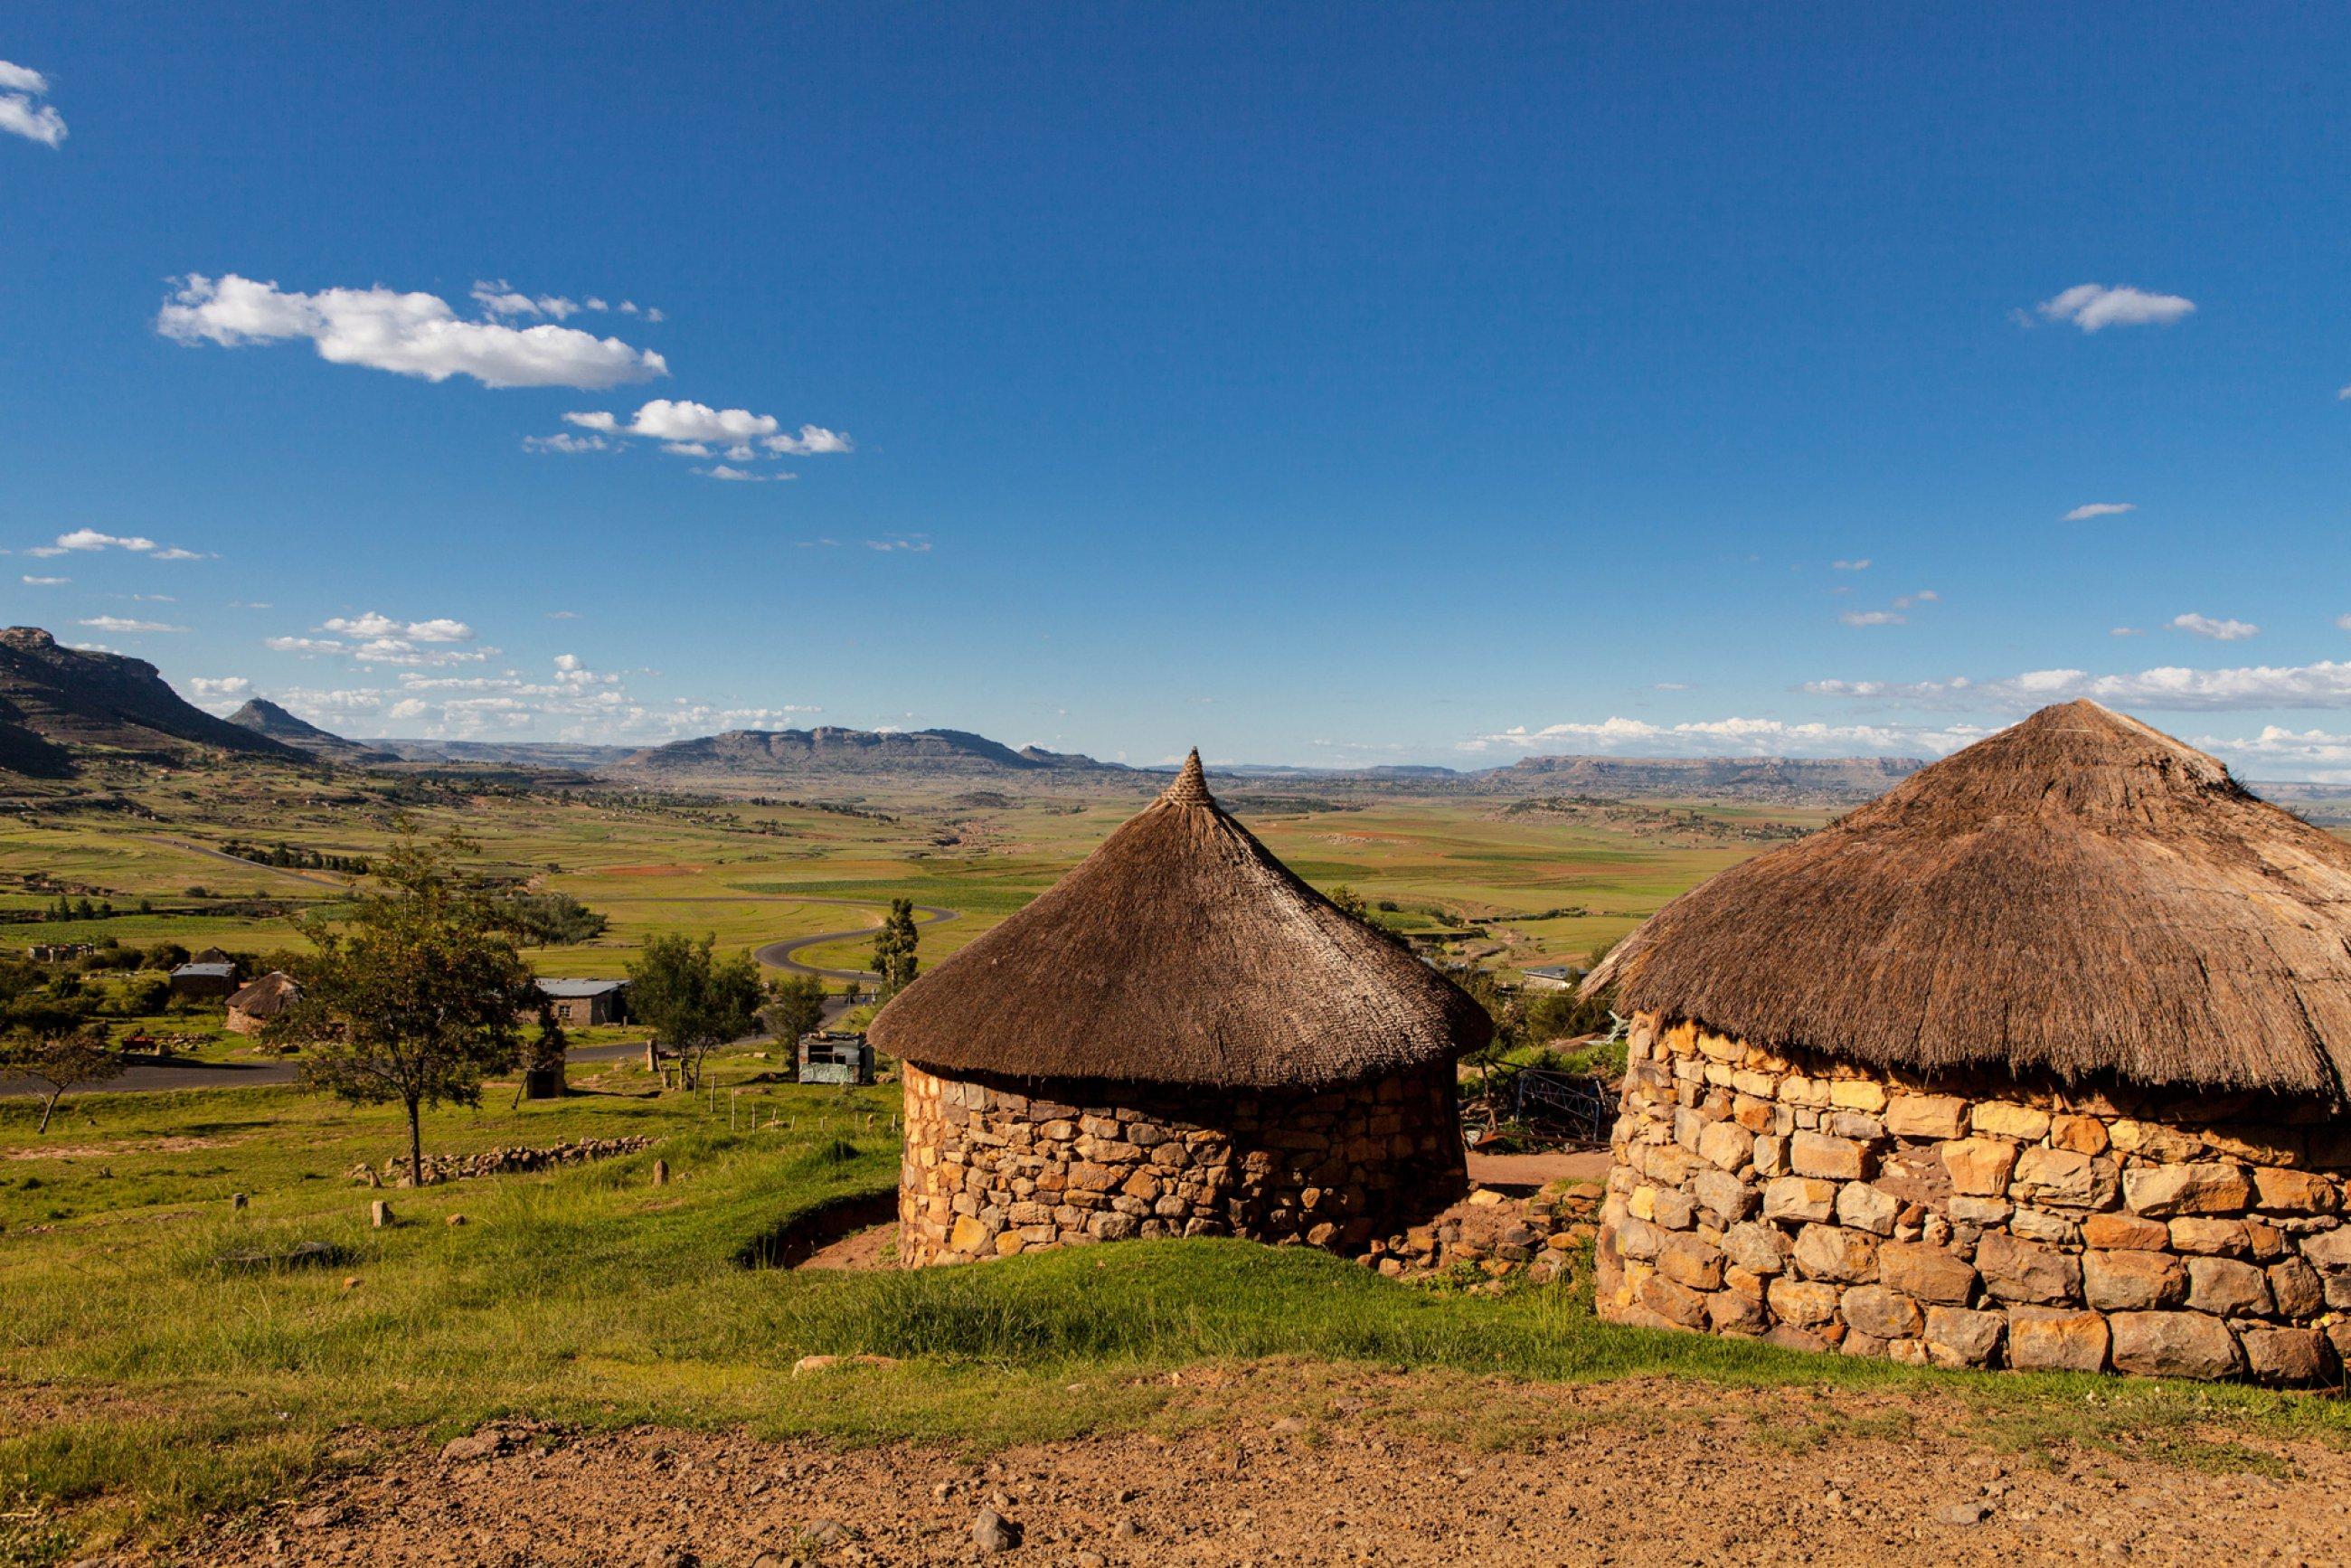 https://bubo.sk/uploads/galleries/16033/lesotho-lesotho-traditional-house-basotho-hut.jpg